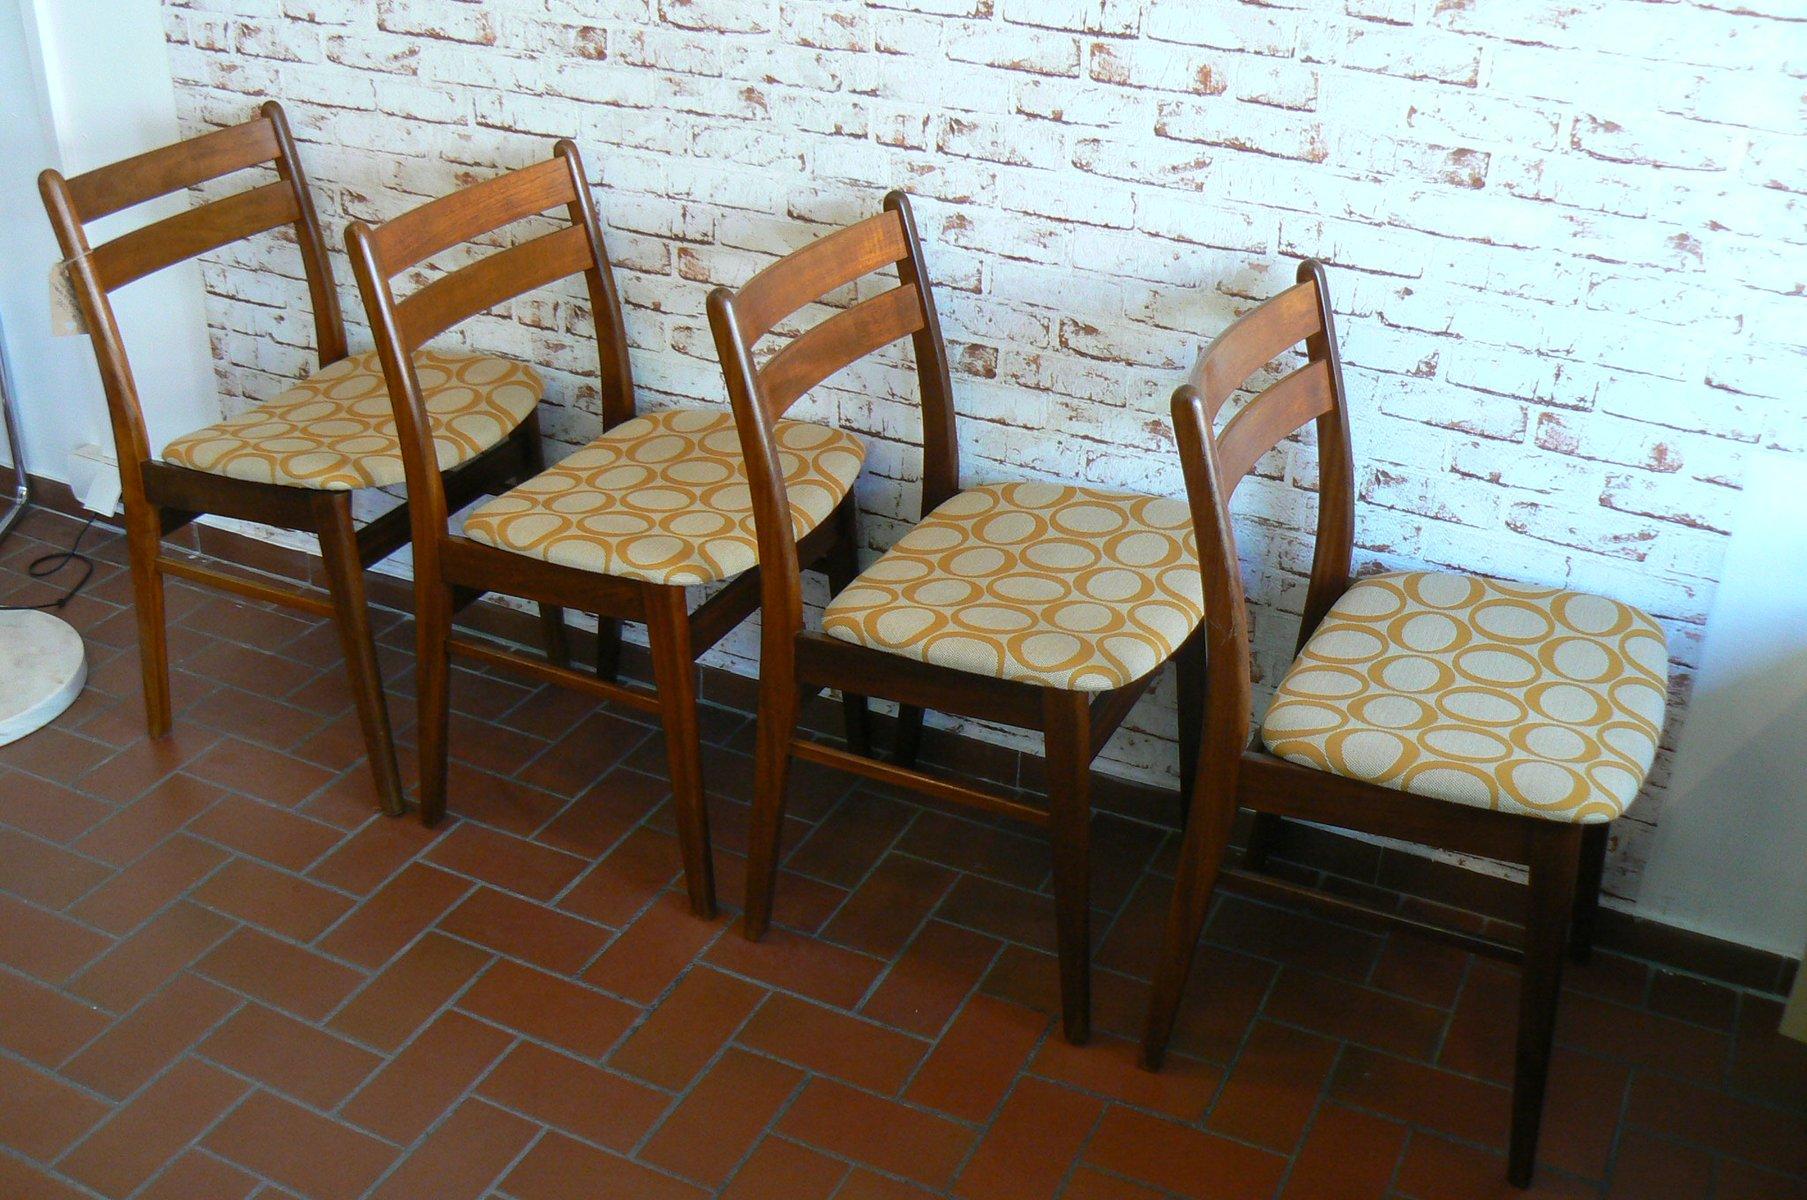 teak esszimmerst hle aus d nemark 1970er 4er set bei pamono kaufen. Black Bedroom Furniture Sets. Home Design Ideas